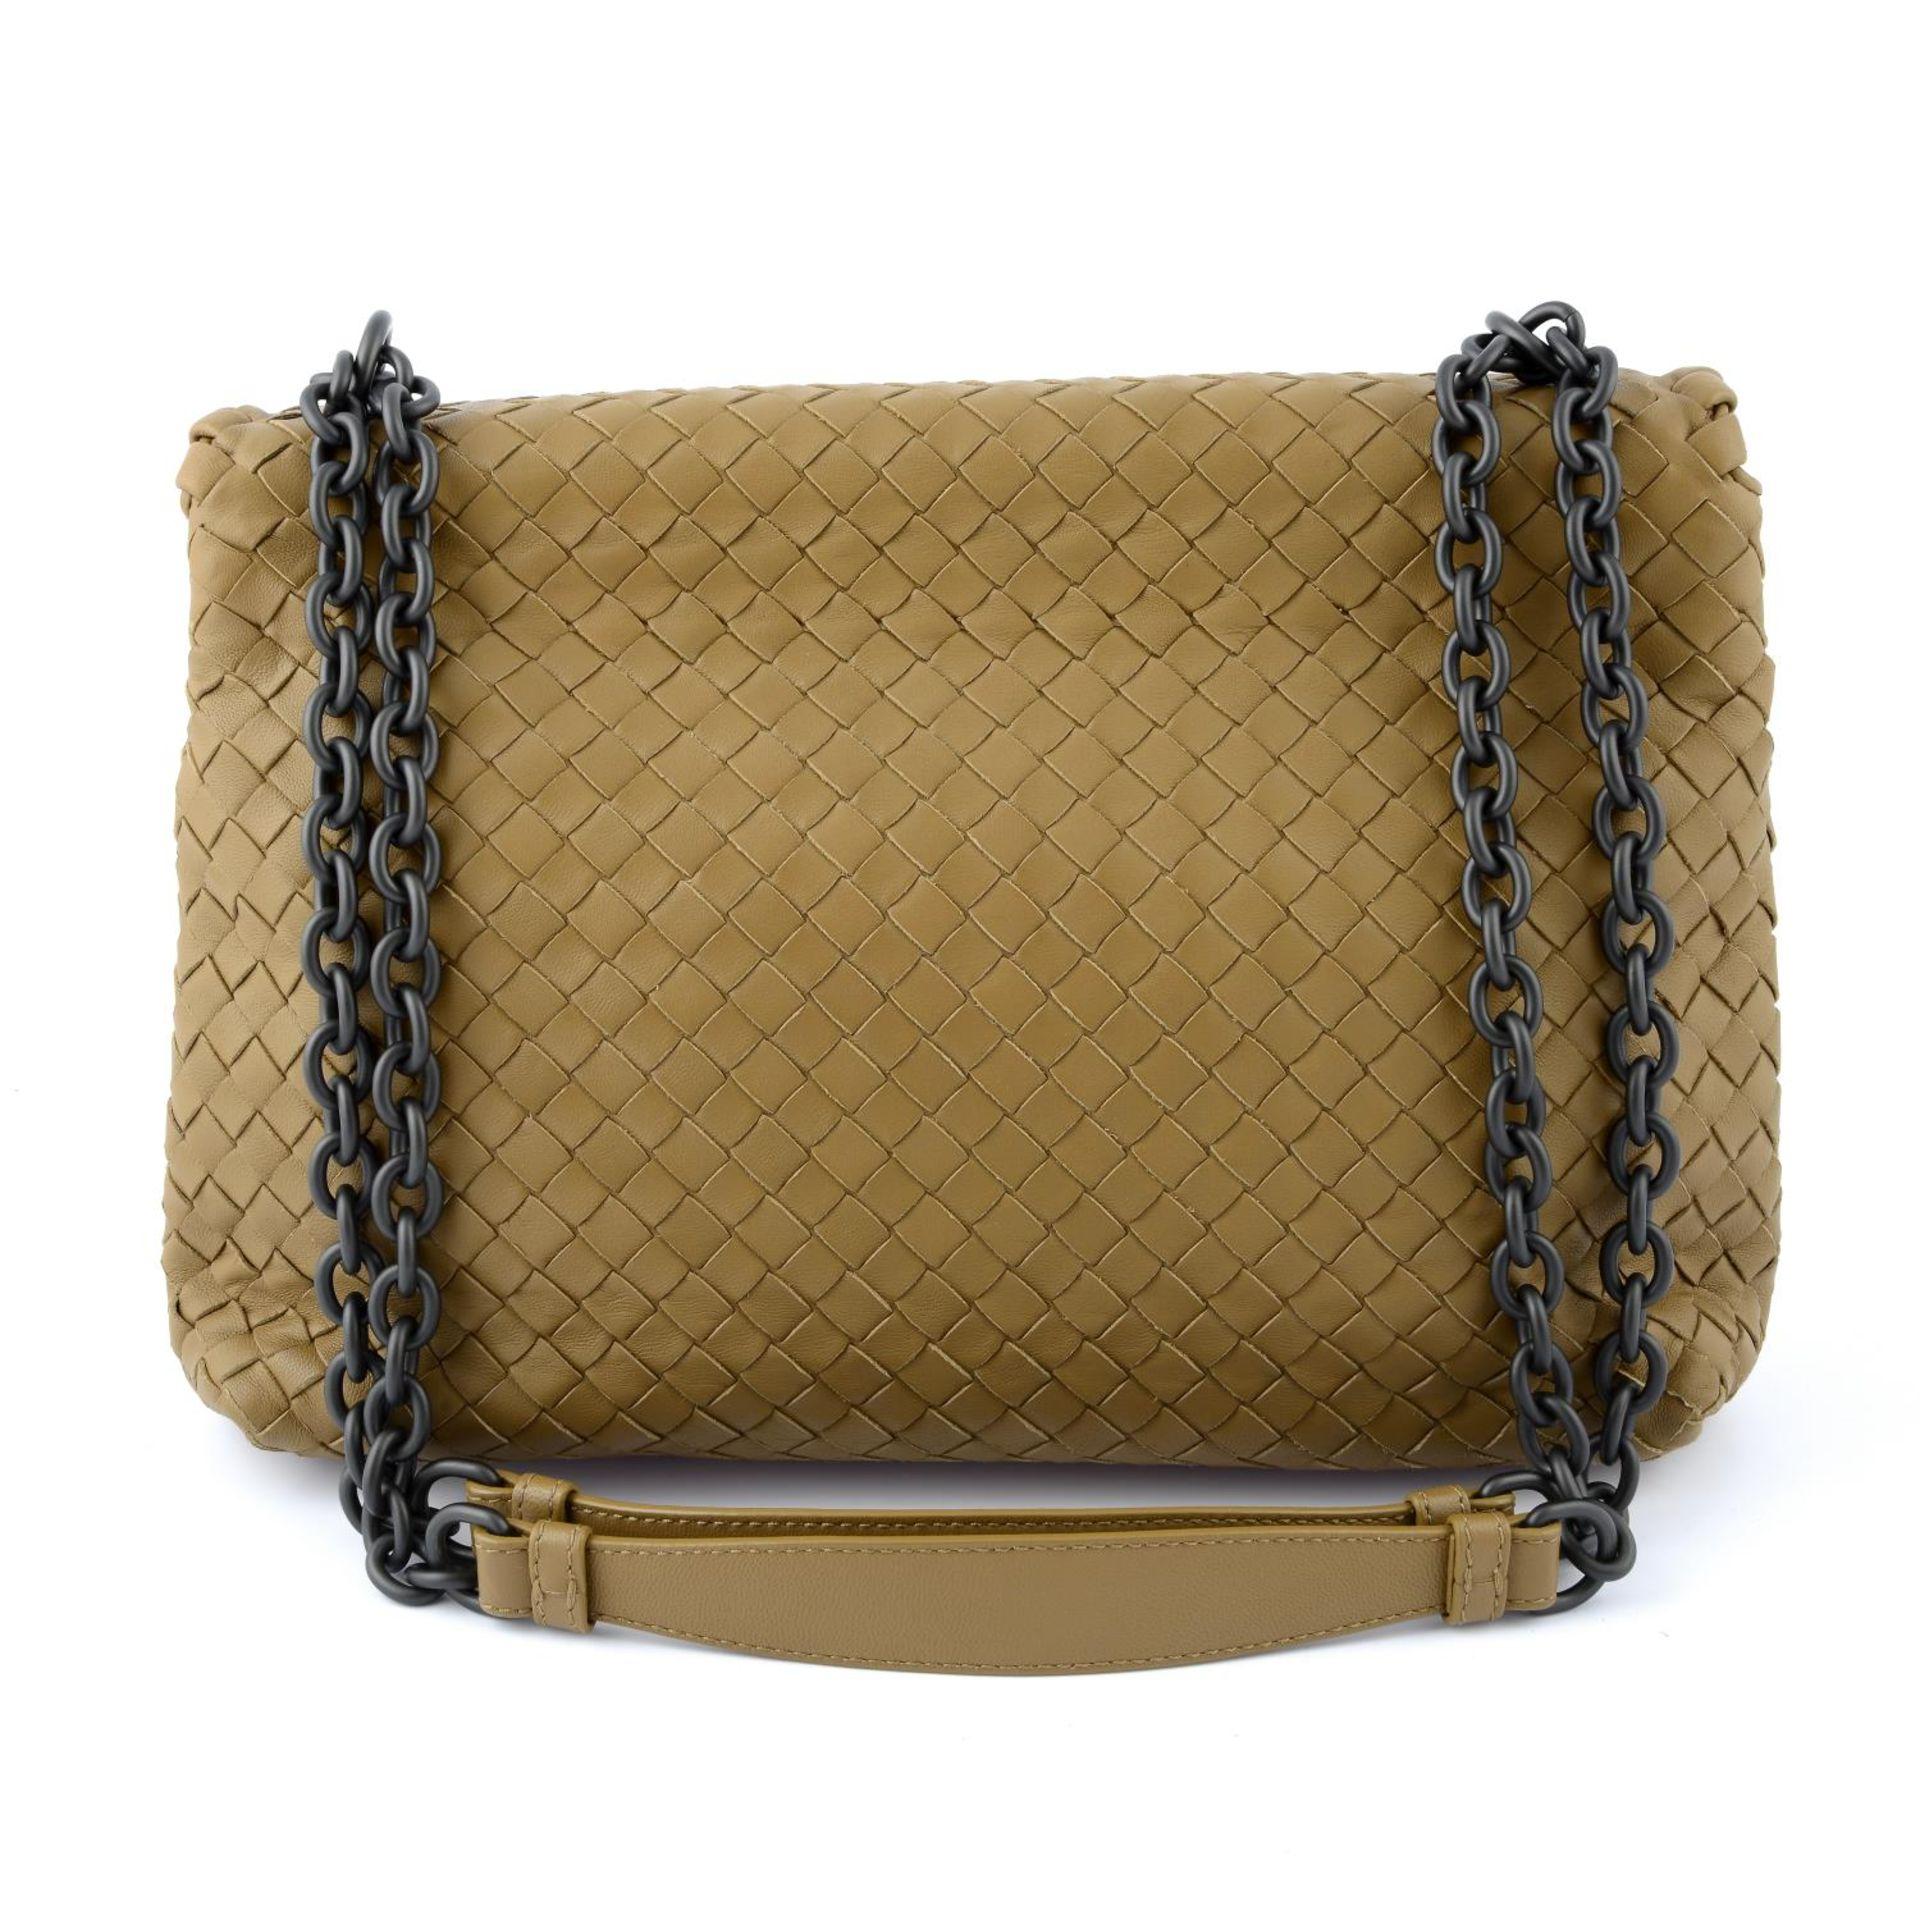 BOTTEGA VENETA - a fold over Intrecciato handbag. - Image 2 of 5